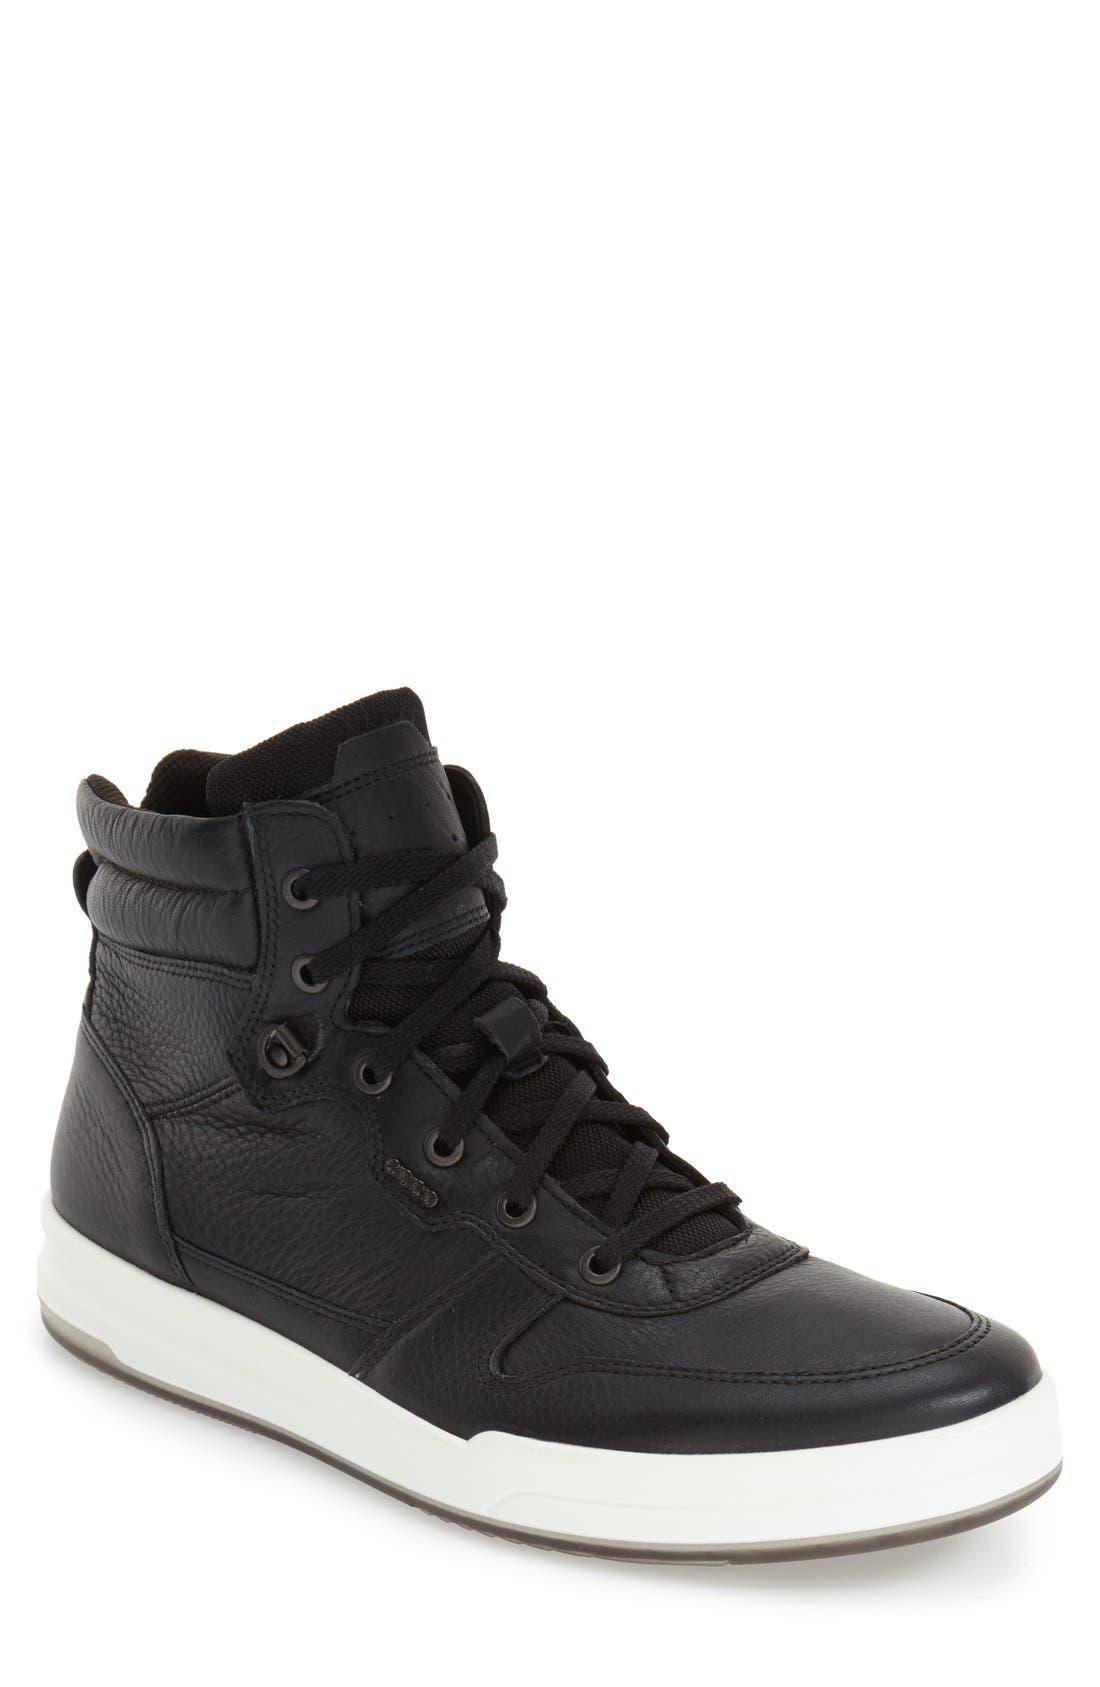 'Jack' High Top Sneaker,                         Main,                         color, 001